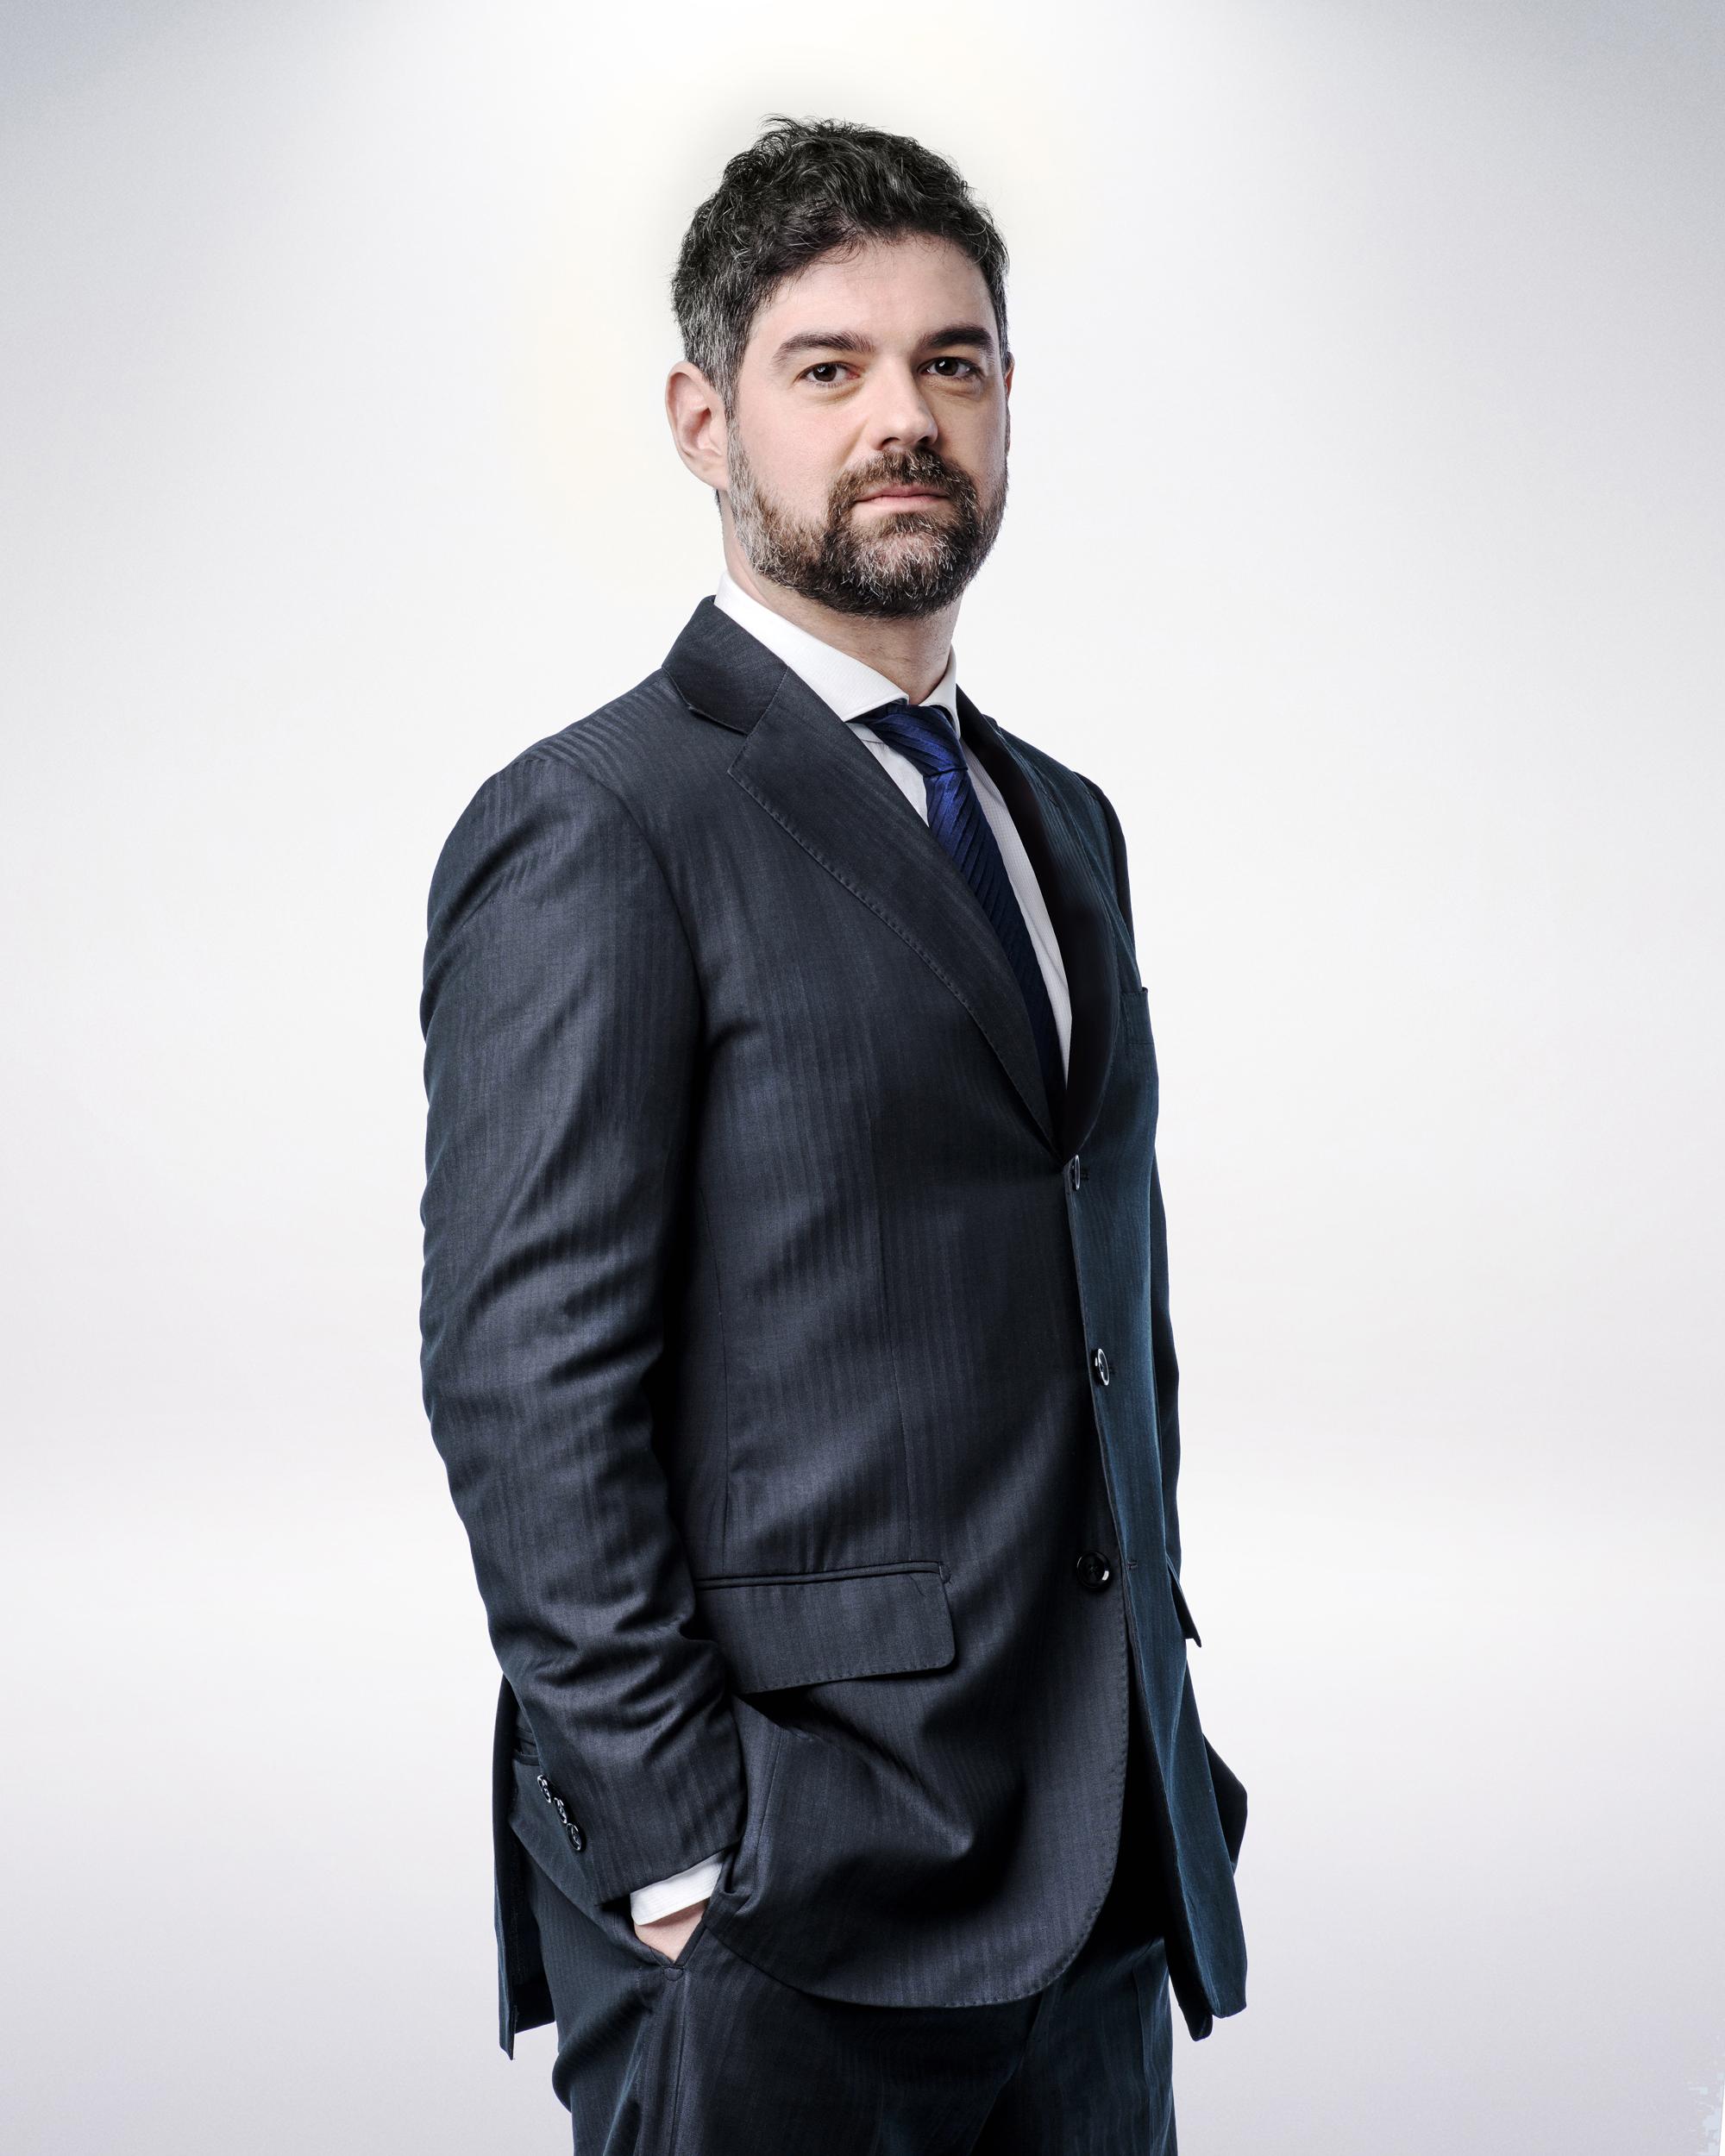 Stefano Faraoni - Athena Founding partner and Director